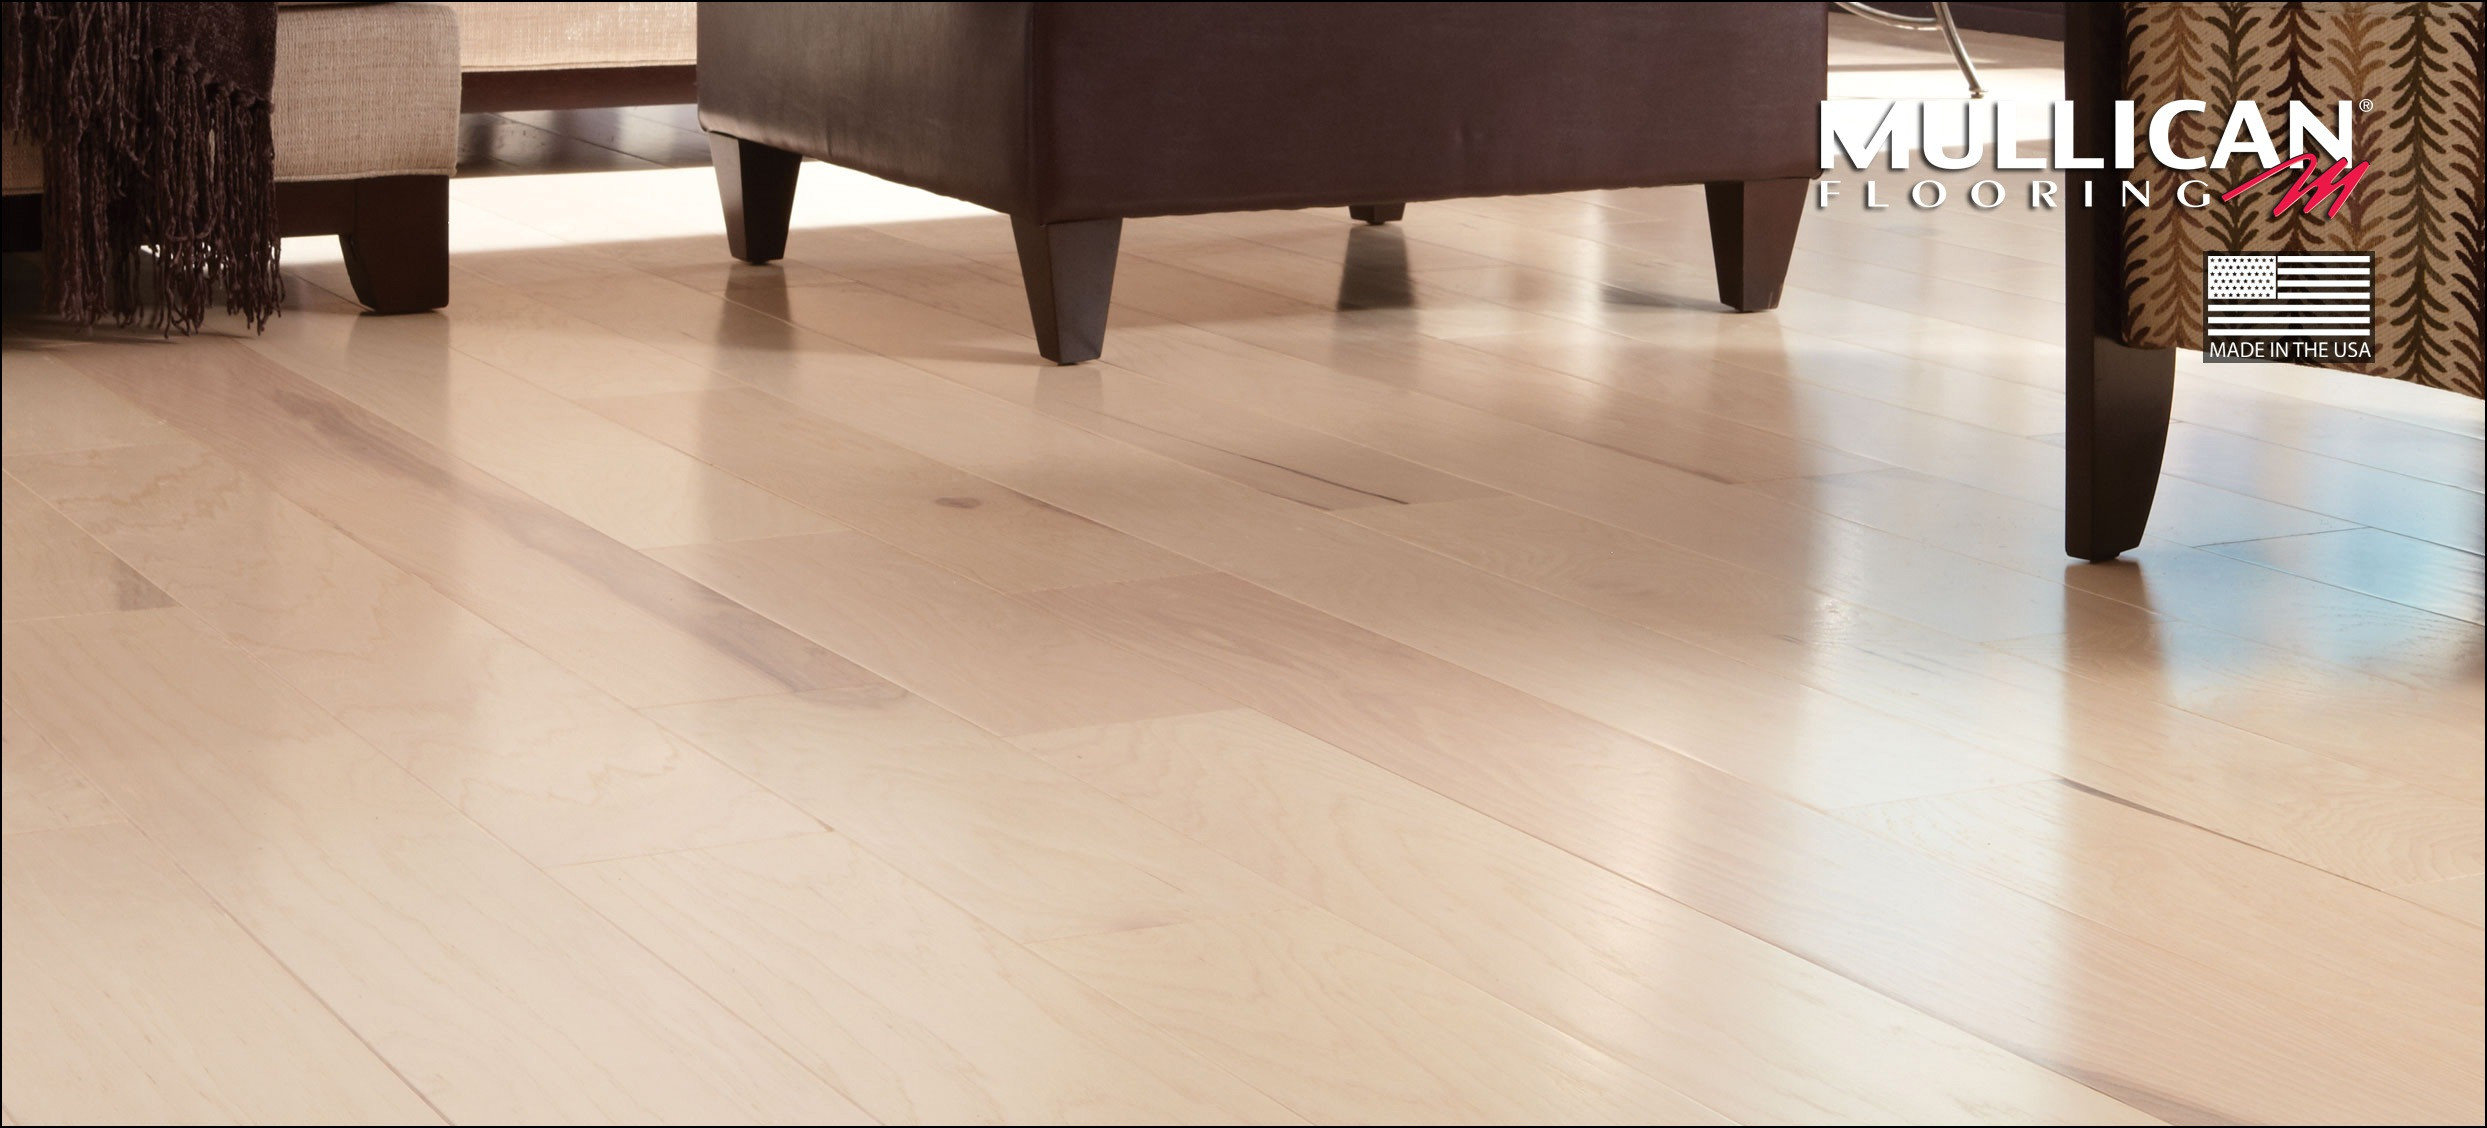 grey hardwood floors toronto of hardwood flooring suppliers france flooring ideas throughout hardwood flooring installation san diego mullican flooring home of hardwood flooring installation san diego